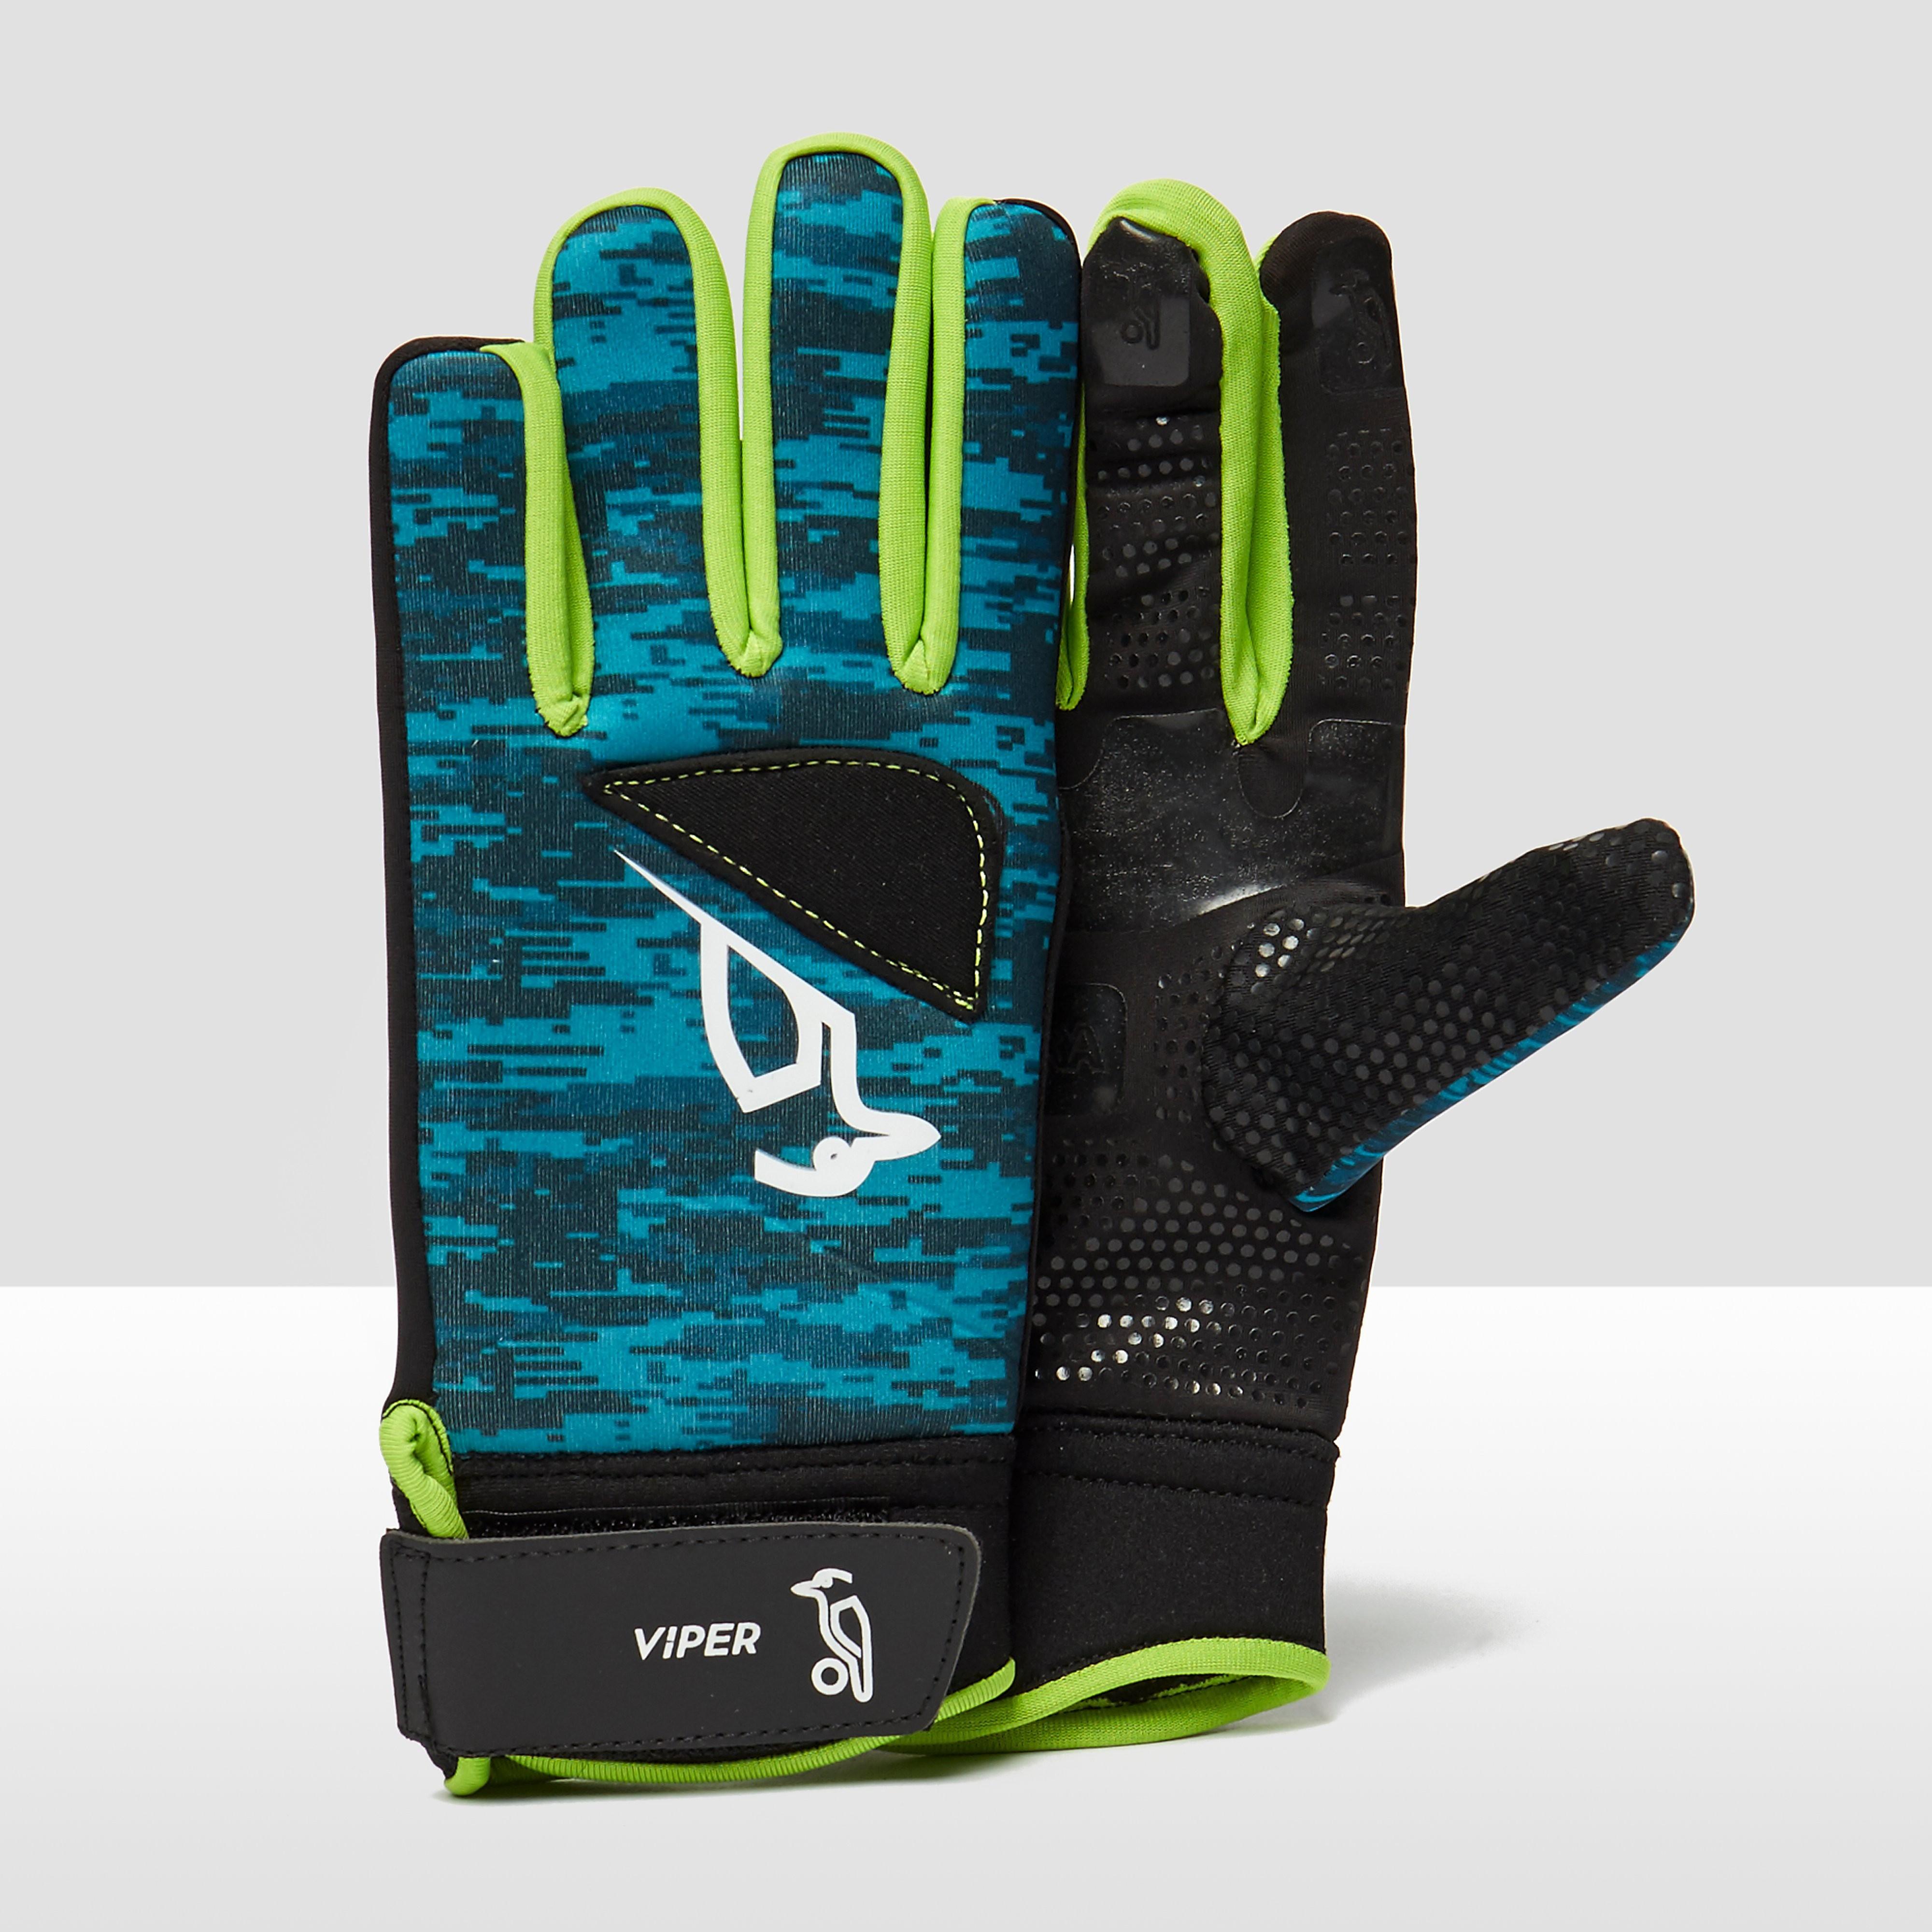 Kookaburra Viper Hand Guard Gloves